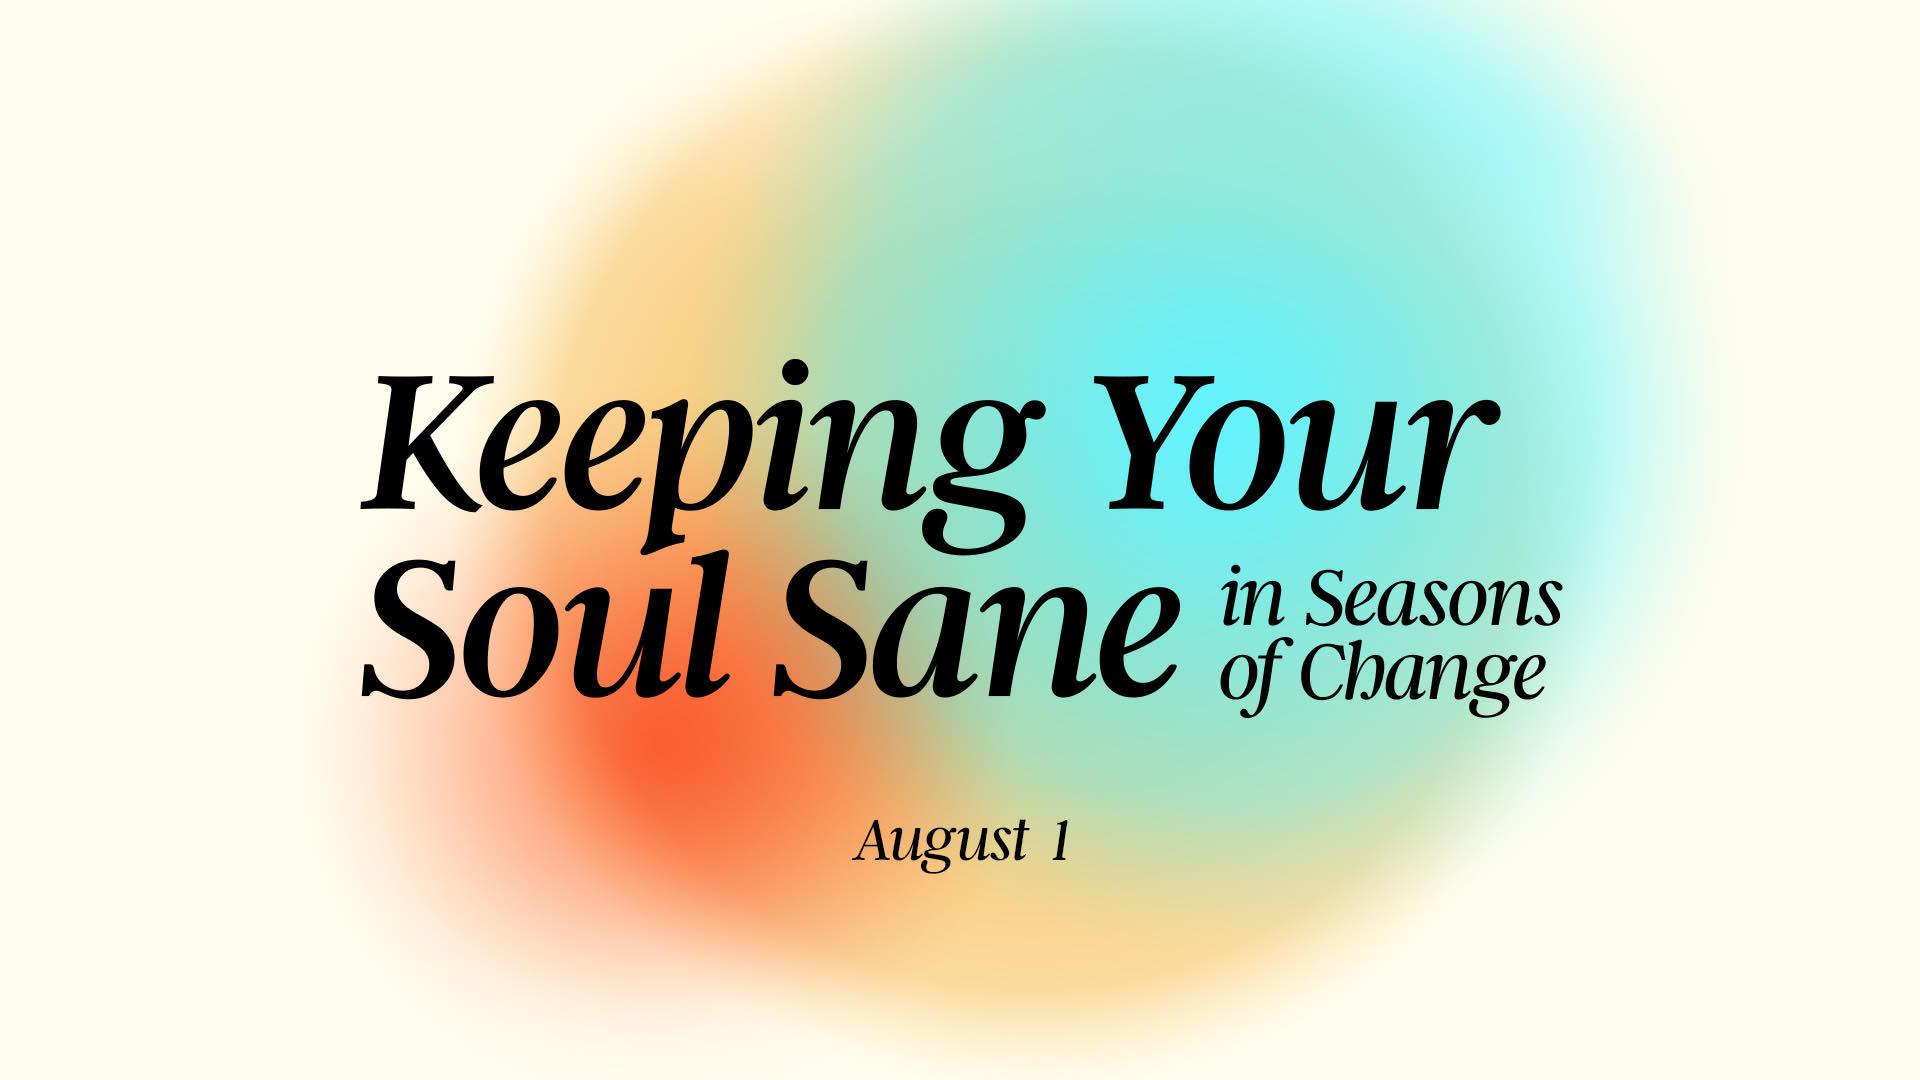 Keeping Your Soul Sane in Seasons of Change